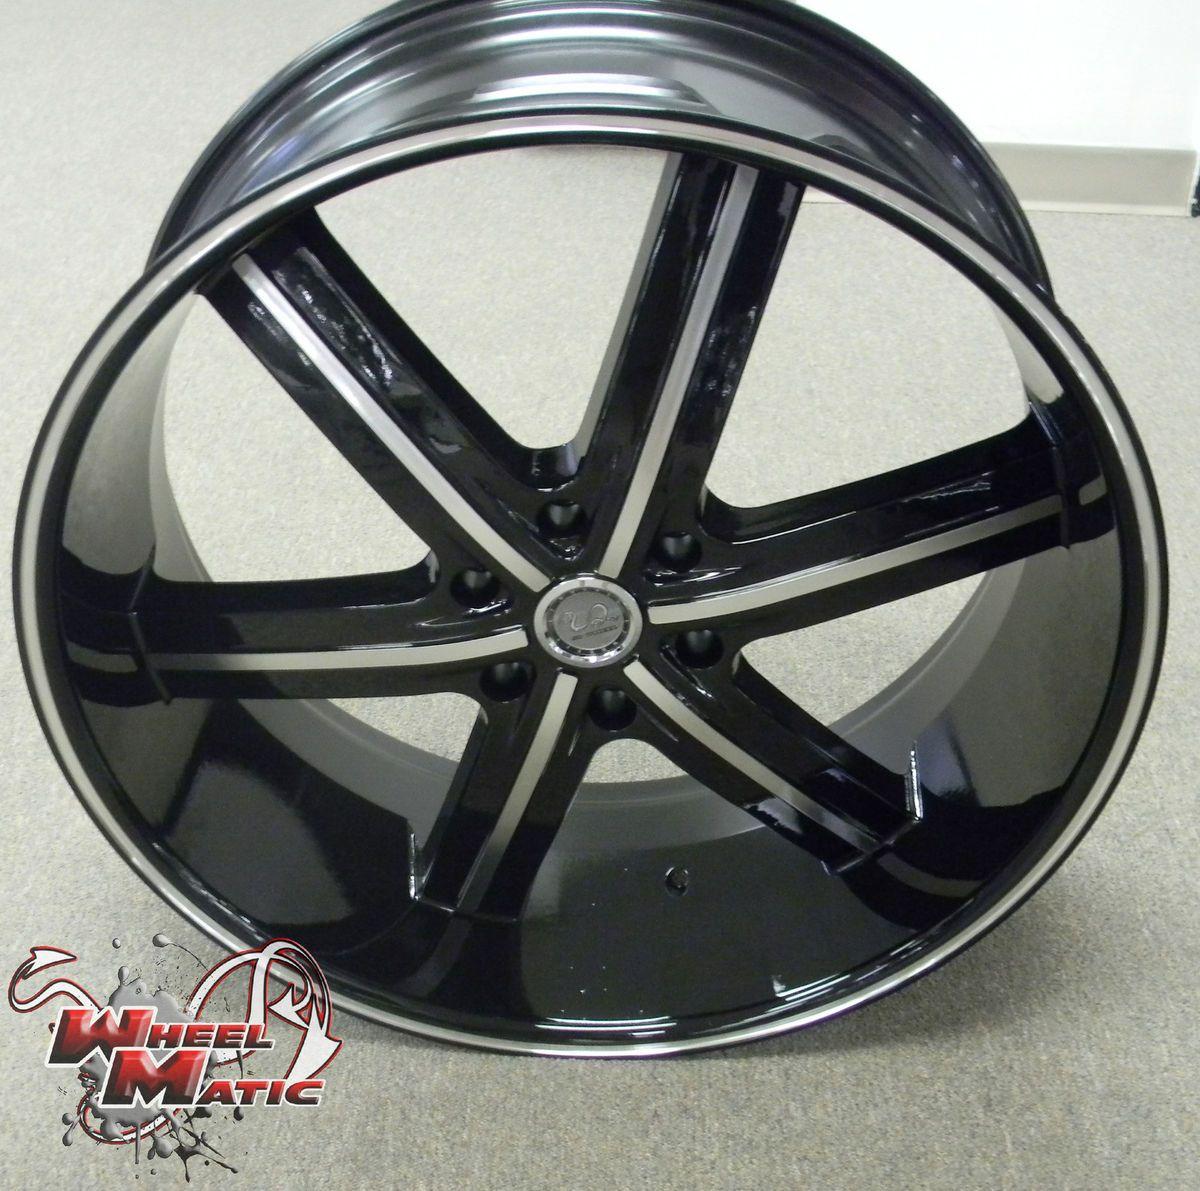 6x139 7 U2 55B Black Machine Wheels Rims Well Beat Any Price